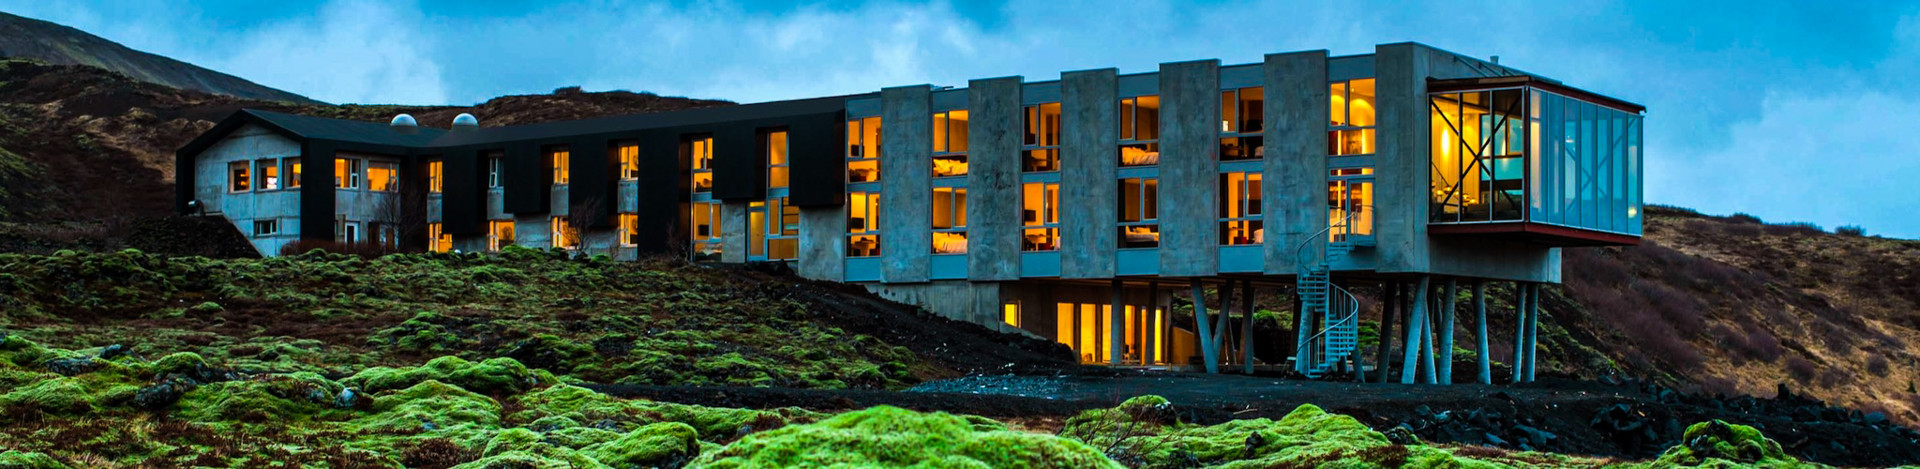 ion luxury adventure hotel iceland original travel. Black Bedroom Furniture Sets. Home Design Ideas